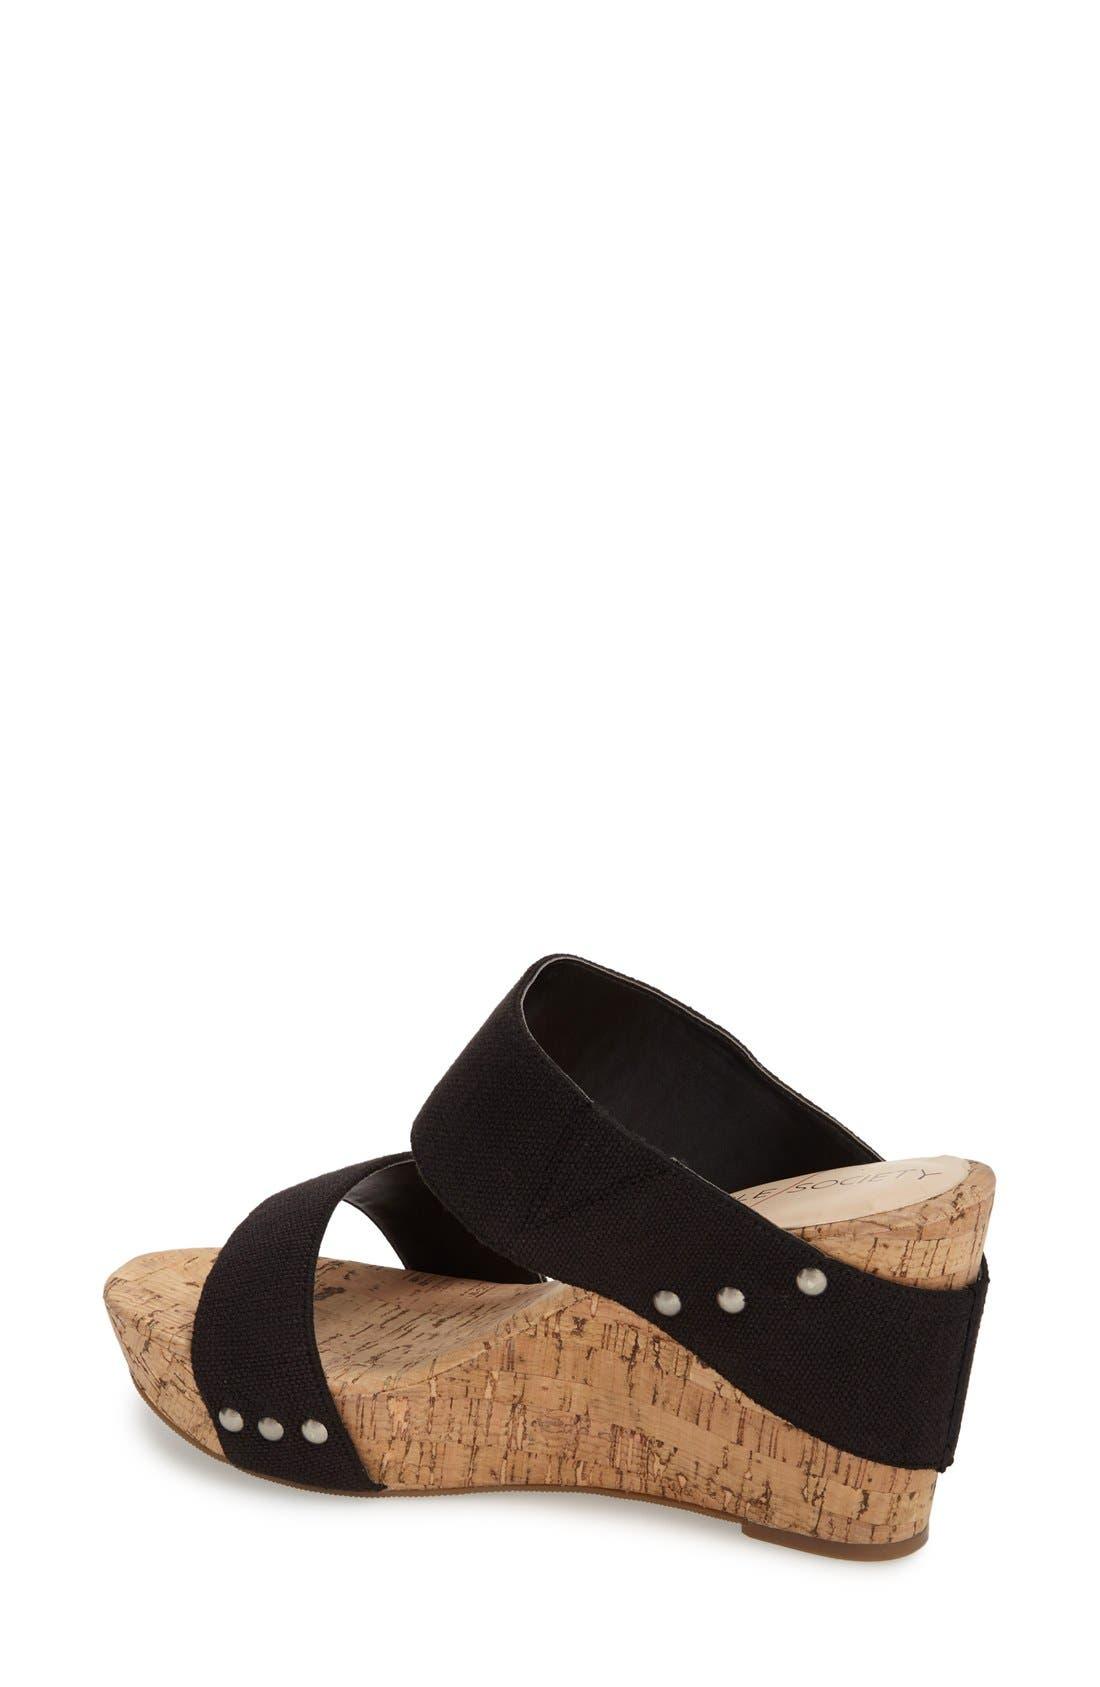 'Emilia 2' Wedge Sandal,                             Alternate thumbnail 2, color,                             Black